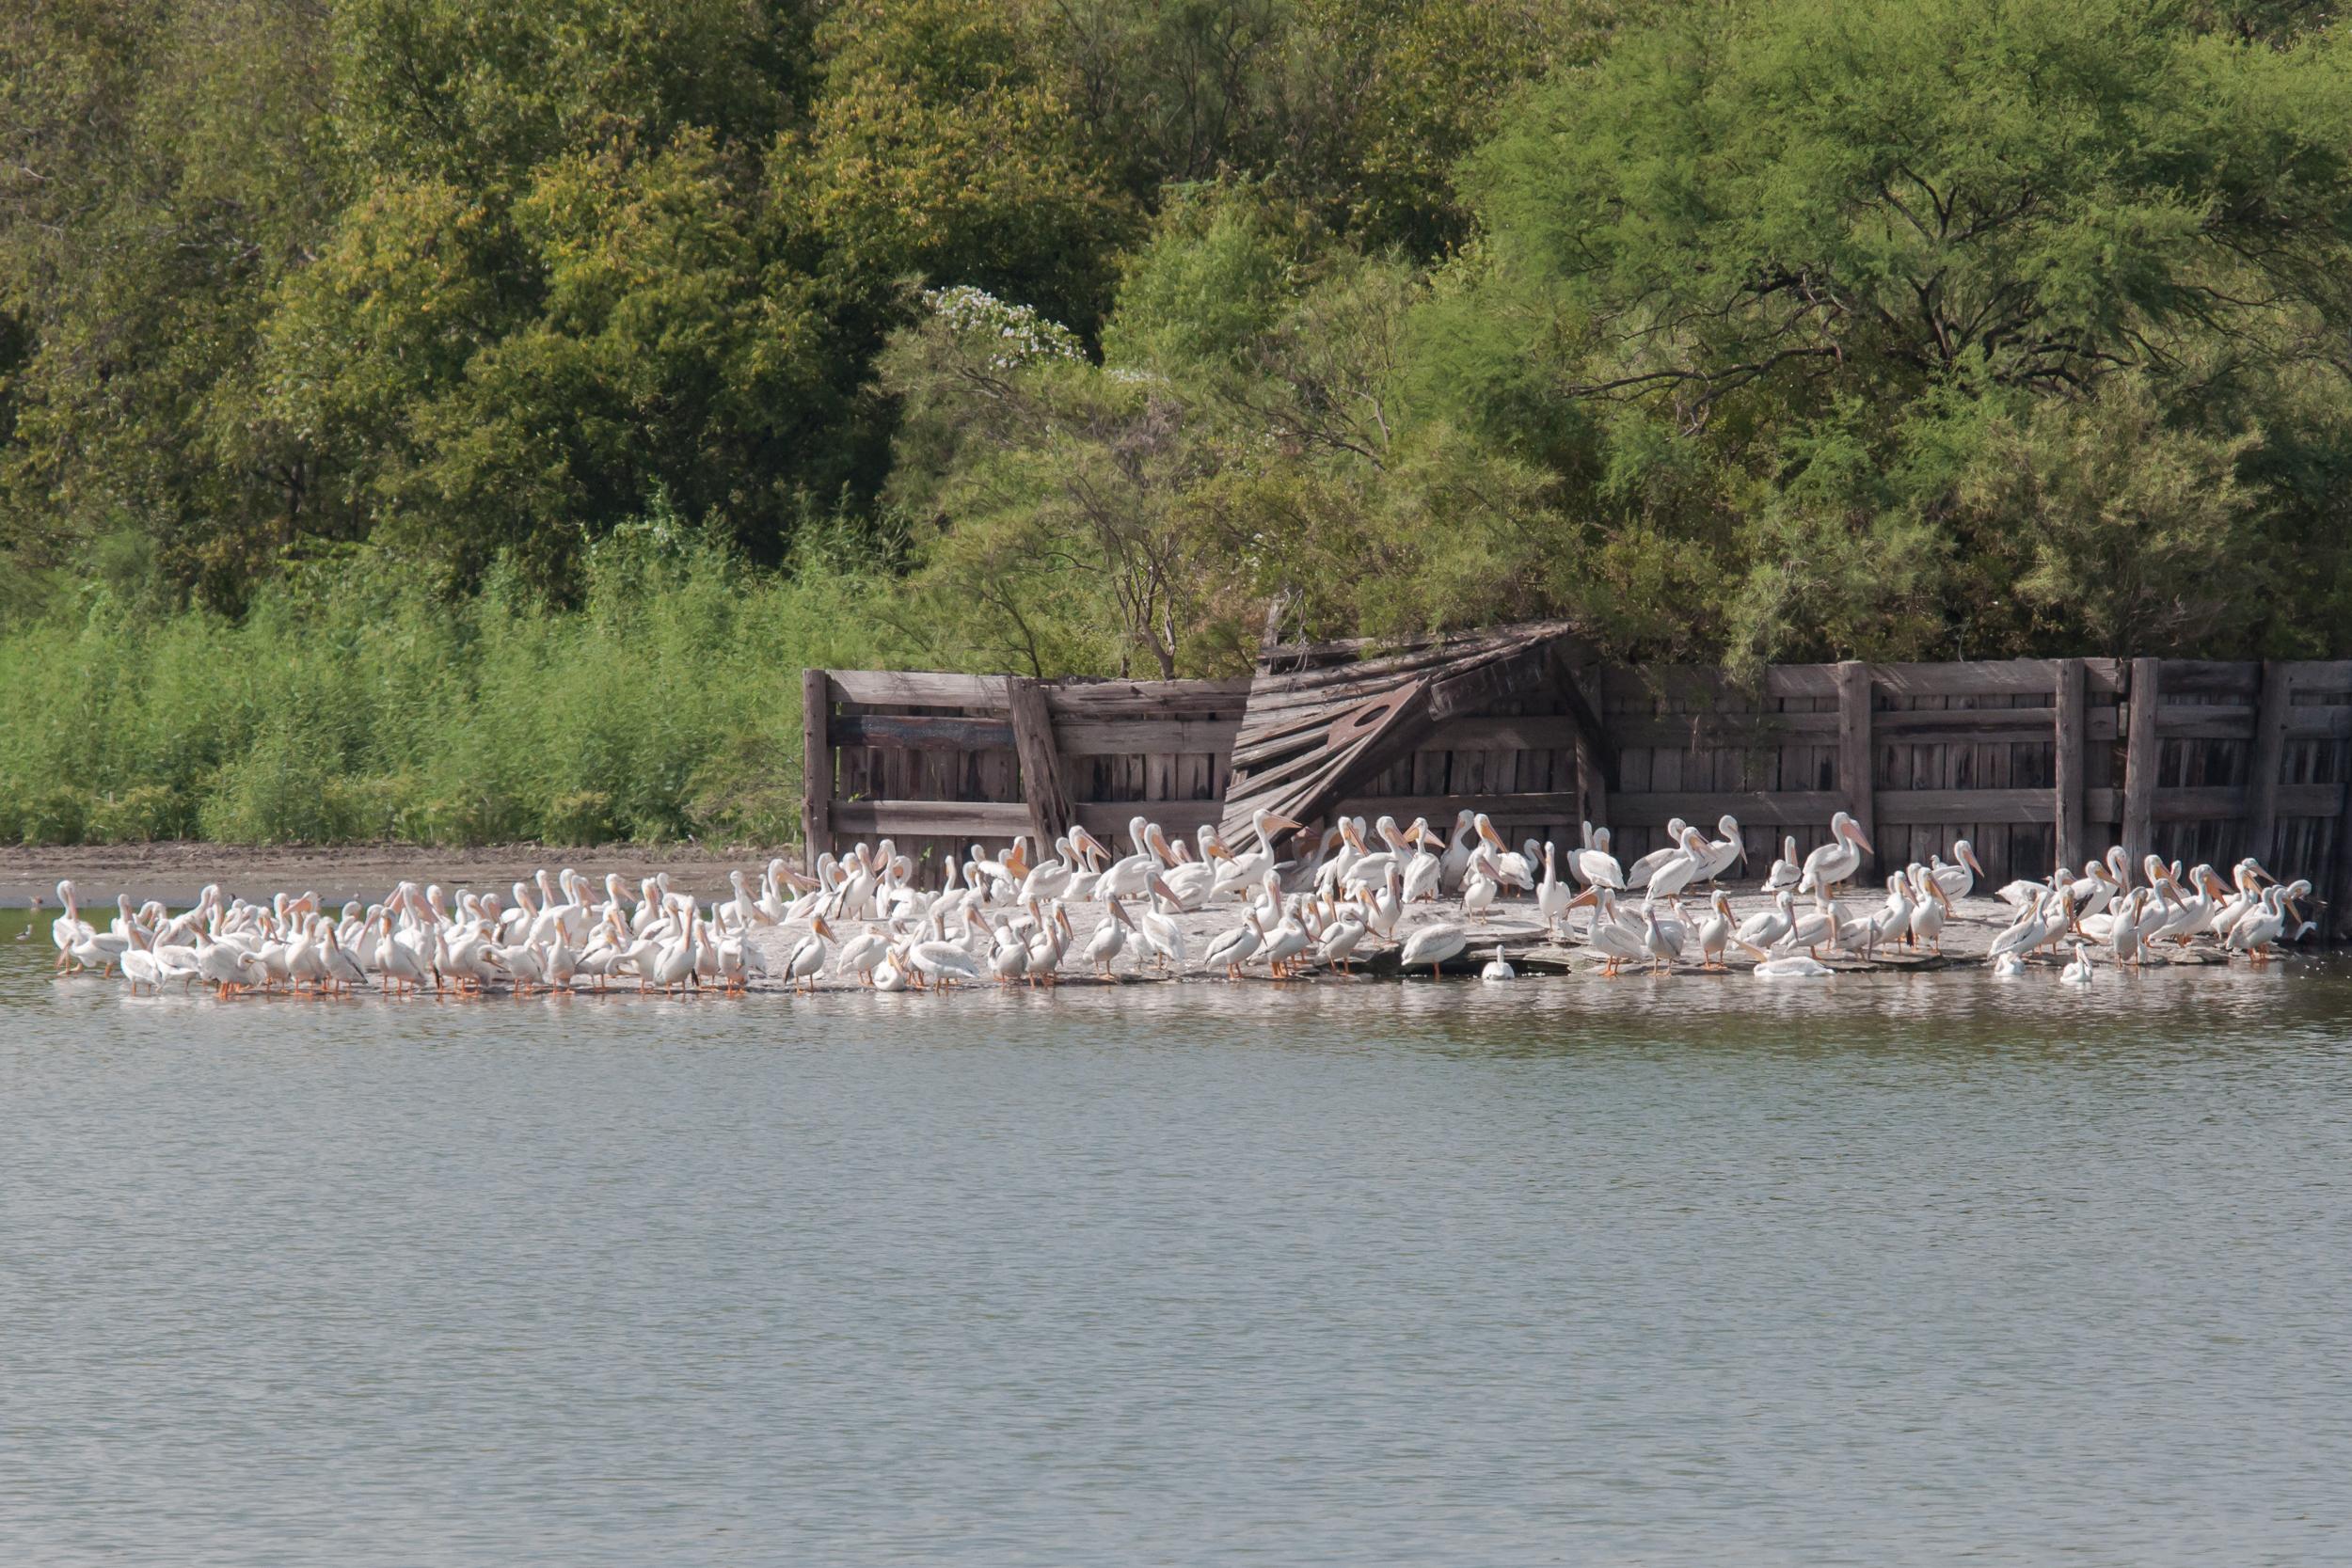 Species: American White Pelican Photo Credit: Alyssia Church Date: September 2017 Location: Mitchell Lake Audubon Center